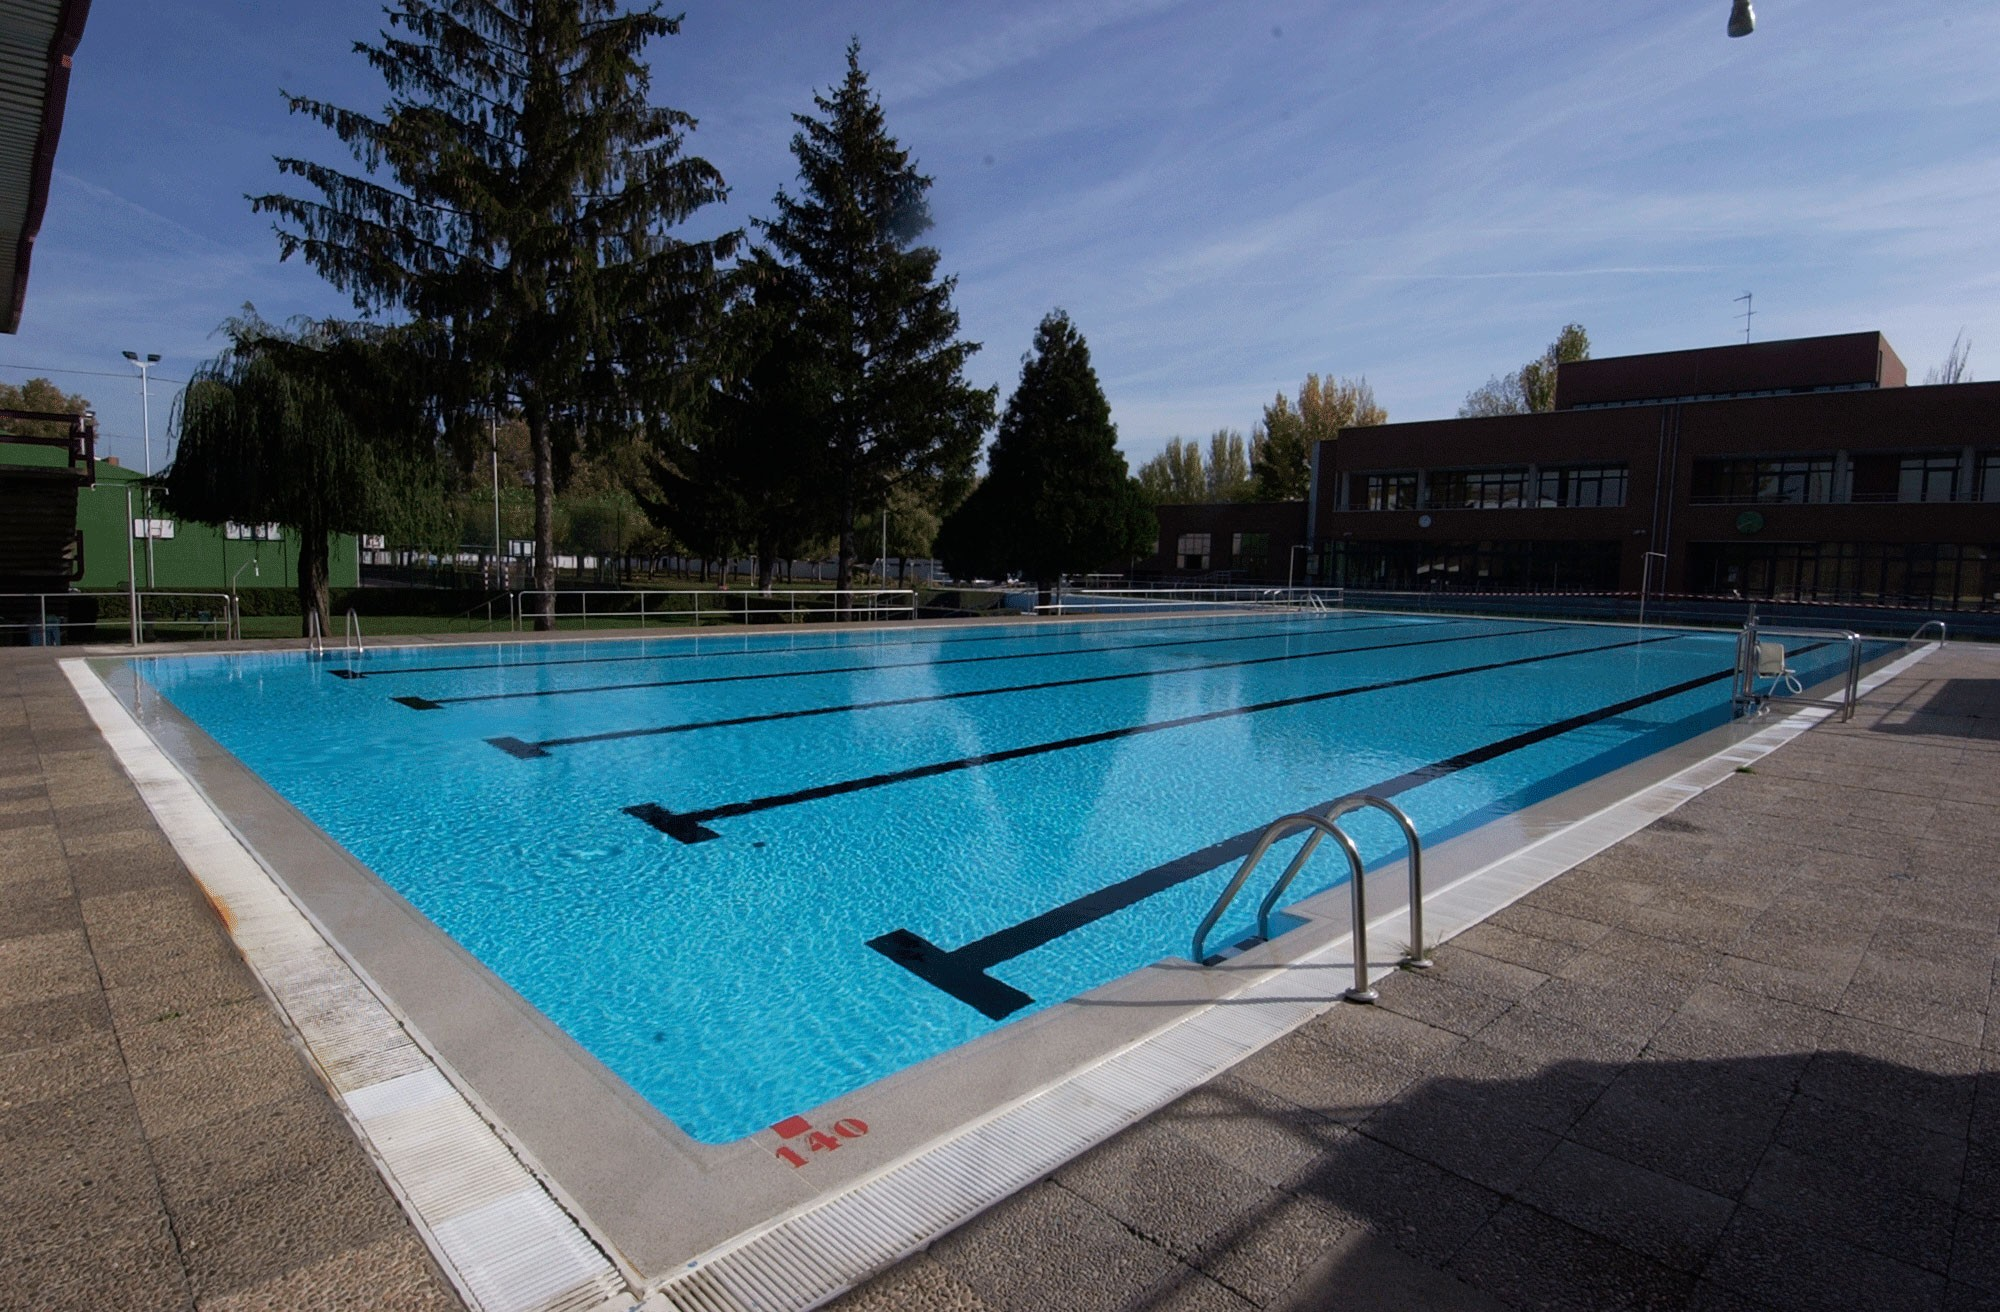 Tipo de piscinas interesting piscina de hormigon with - Piscinas tipo playa ...